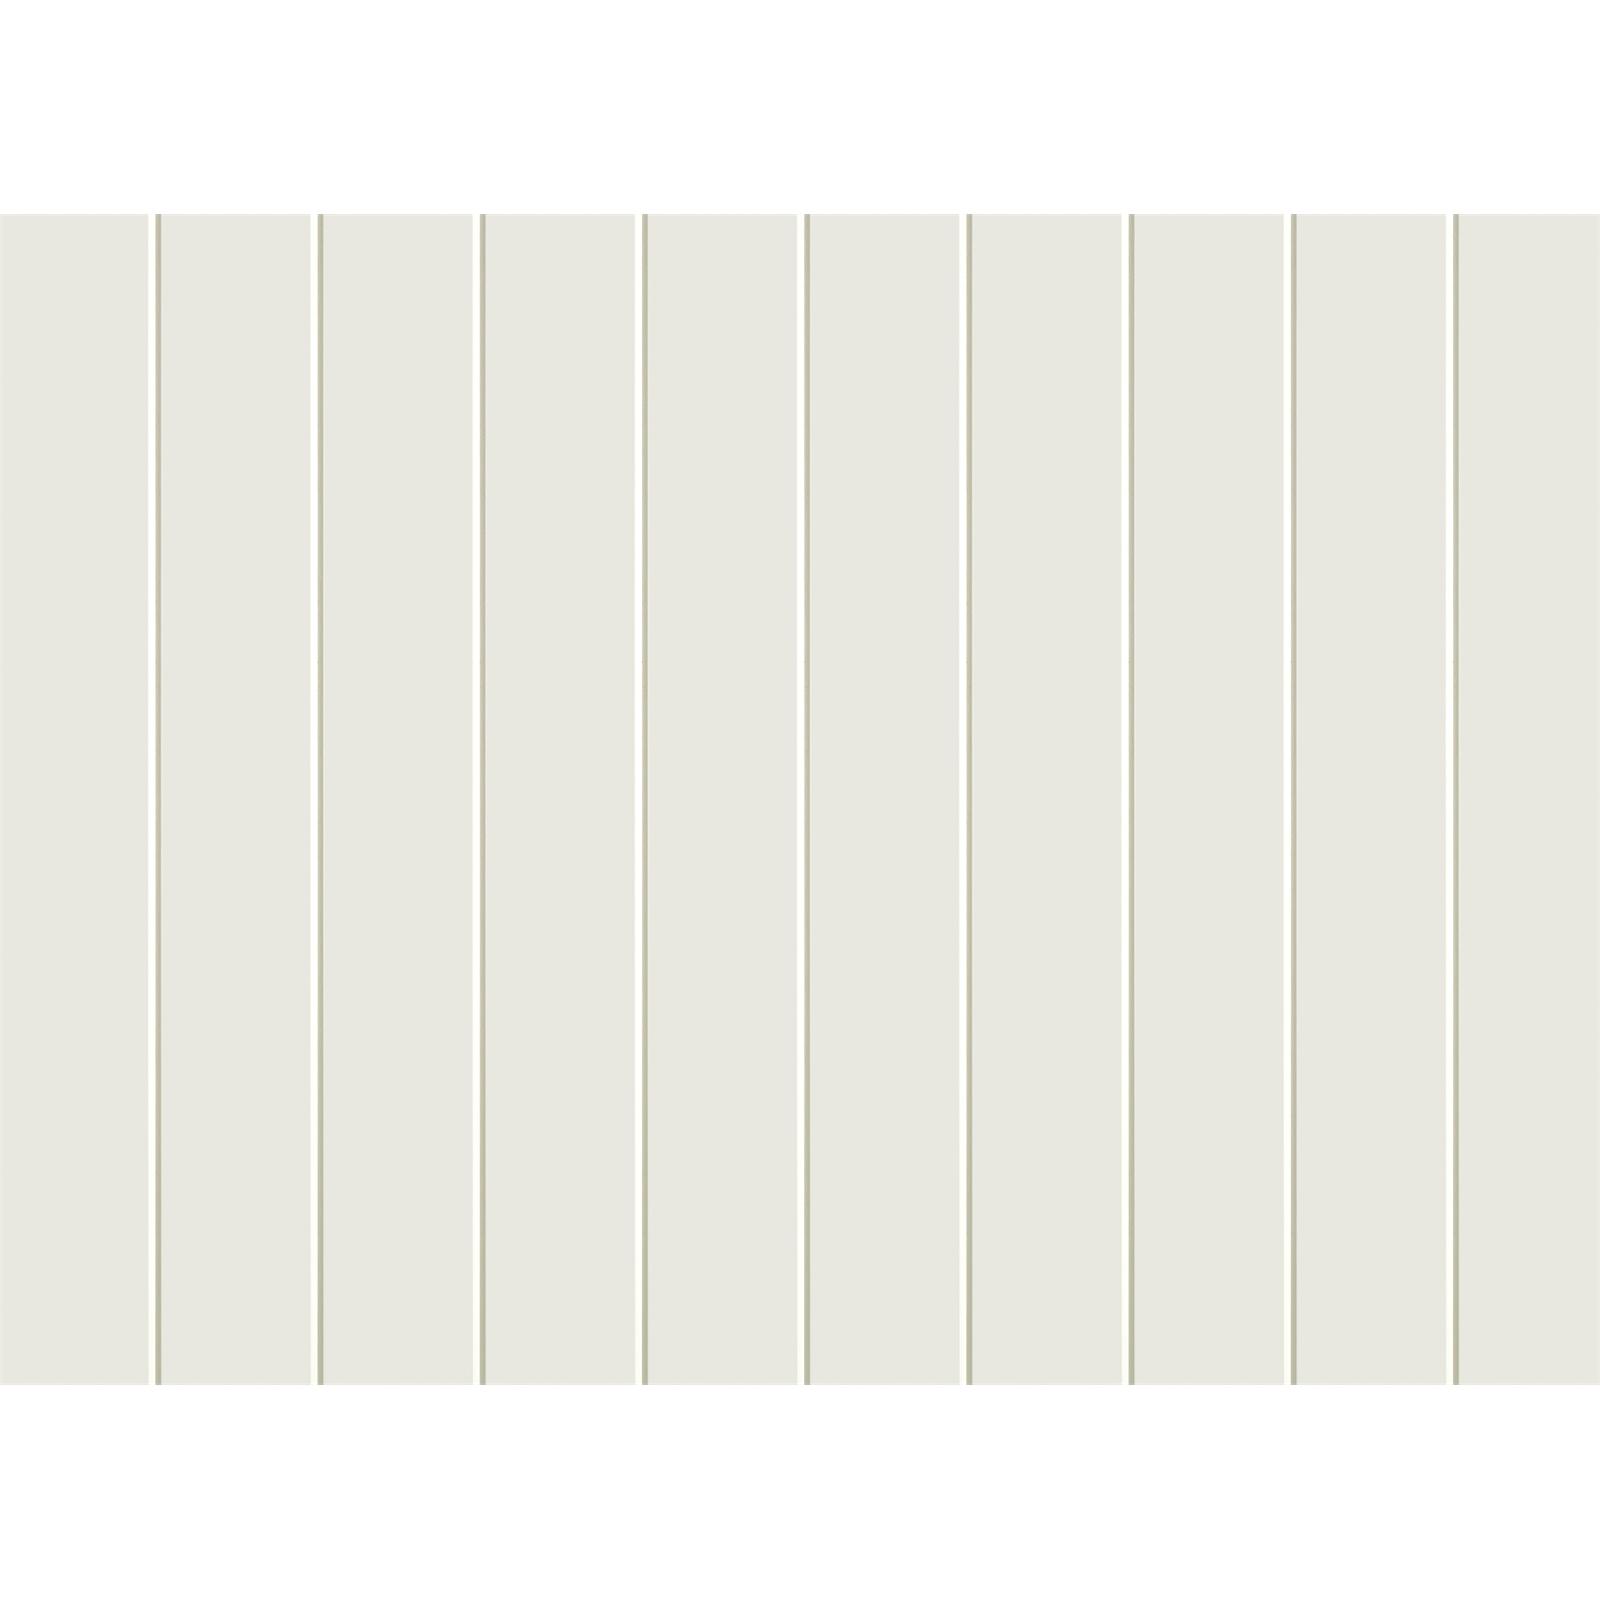 Easycraft 2700 x 1200 x 9mm EasyVJ Primed Interior Decorative Lining